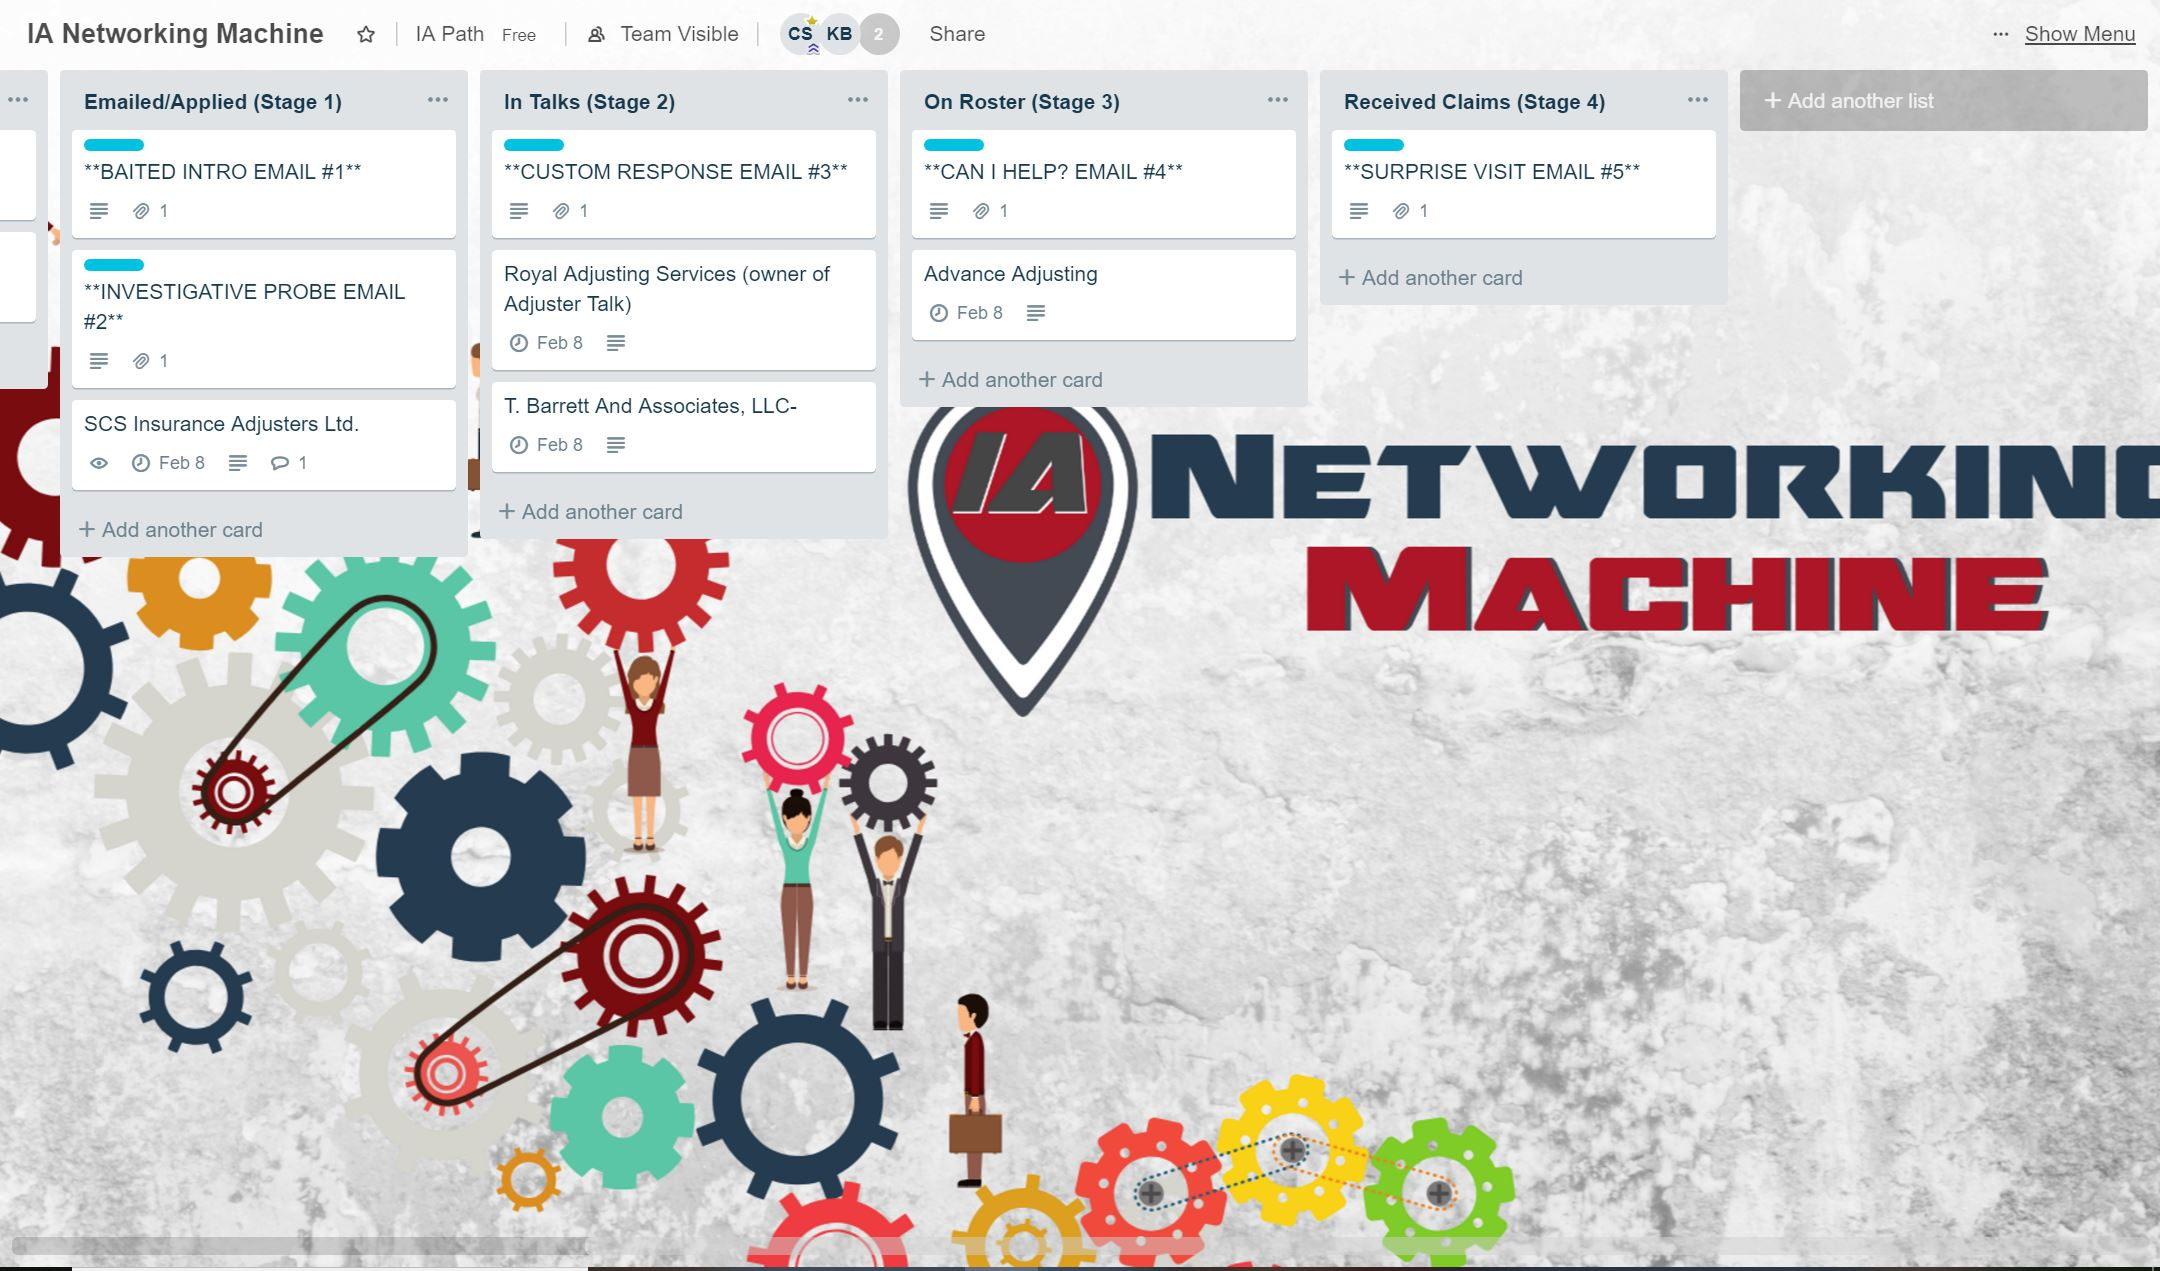 IA Networking Machine